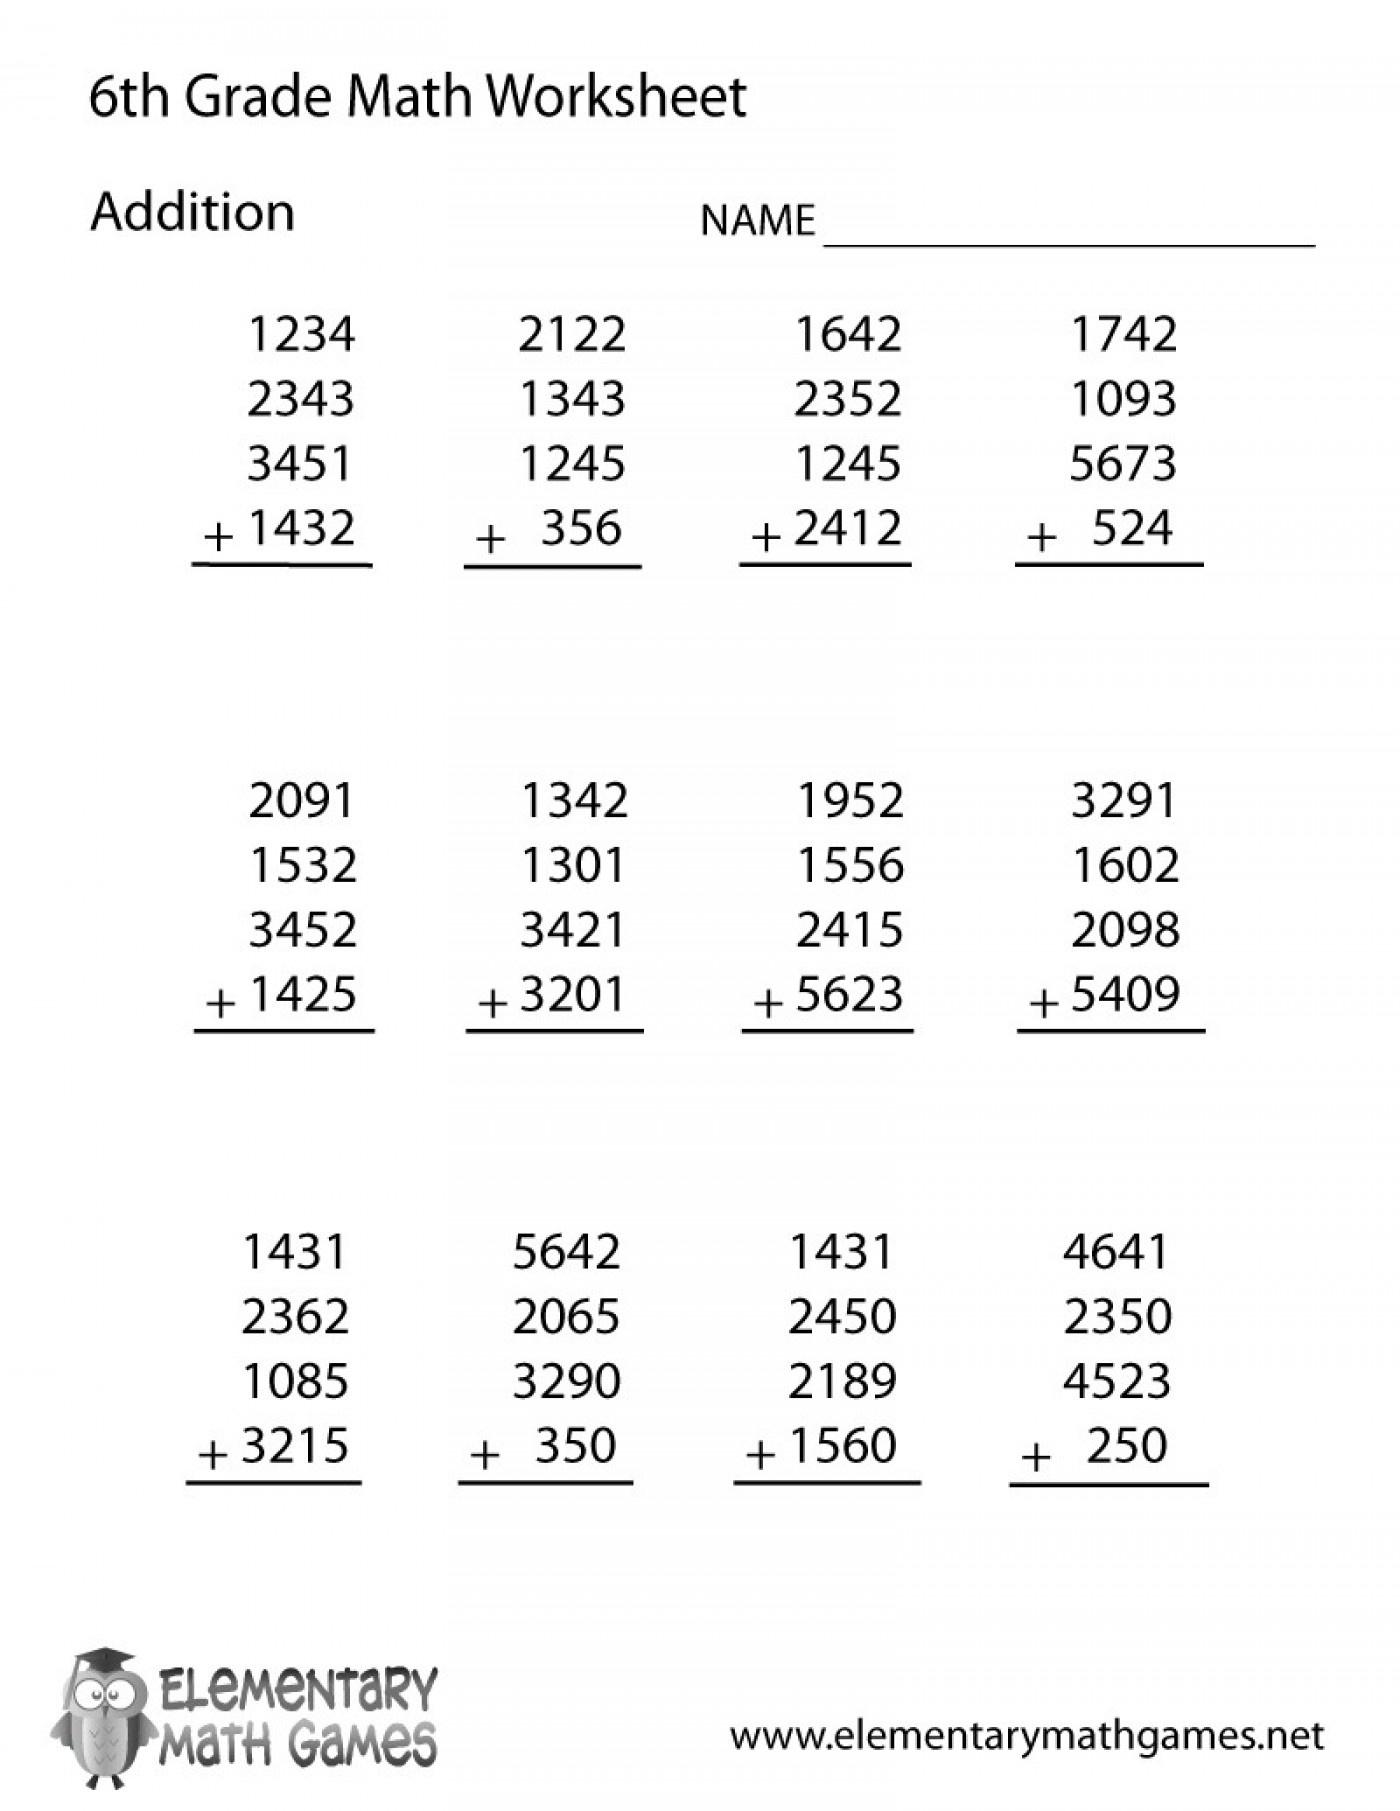 Math Worksheets Year Maths Free Printable 6Th Grade Fantastic 6 Pdf - Free Printable 6Th Grade Worksheets